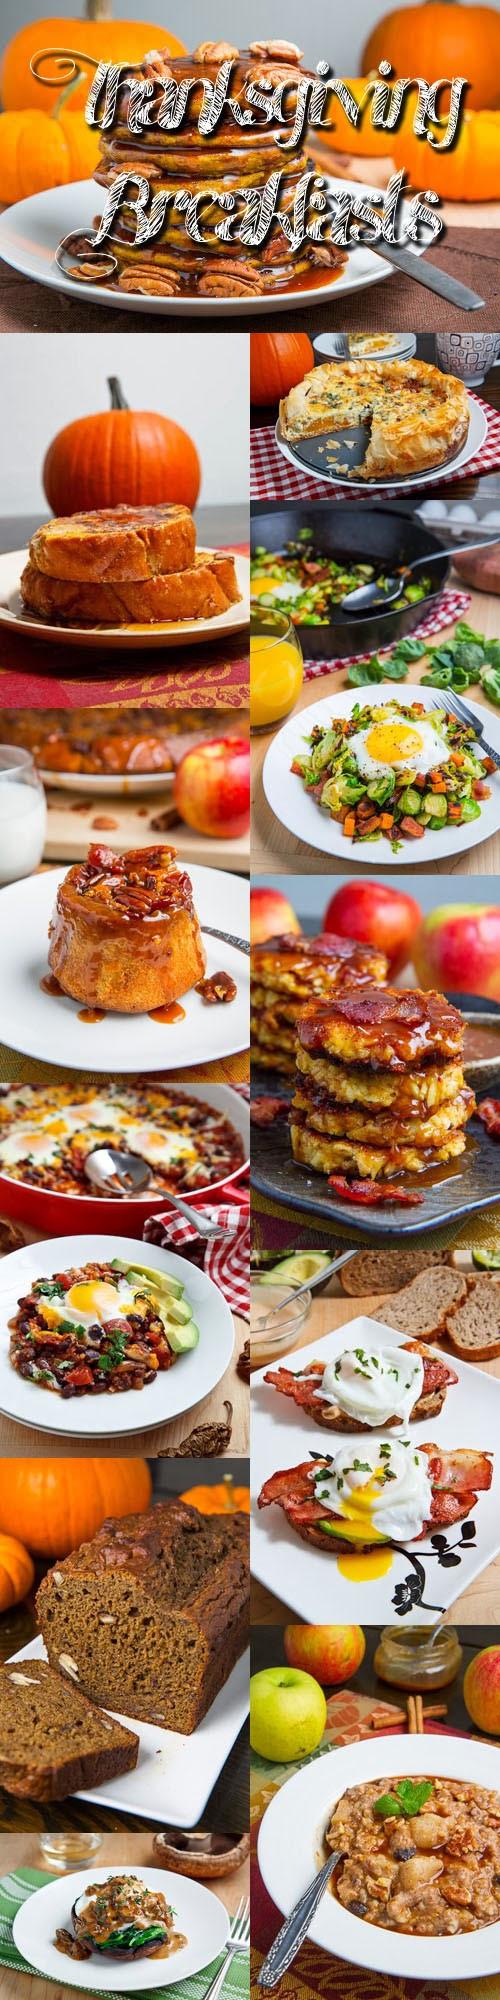 Thanksgiving Breakfast Ideas  Thanksgiving Breakfast Recipes on Closet Cooking